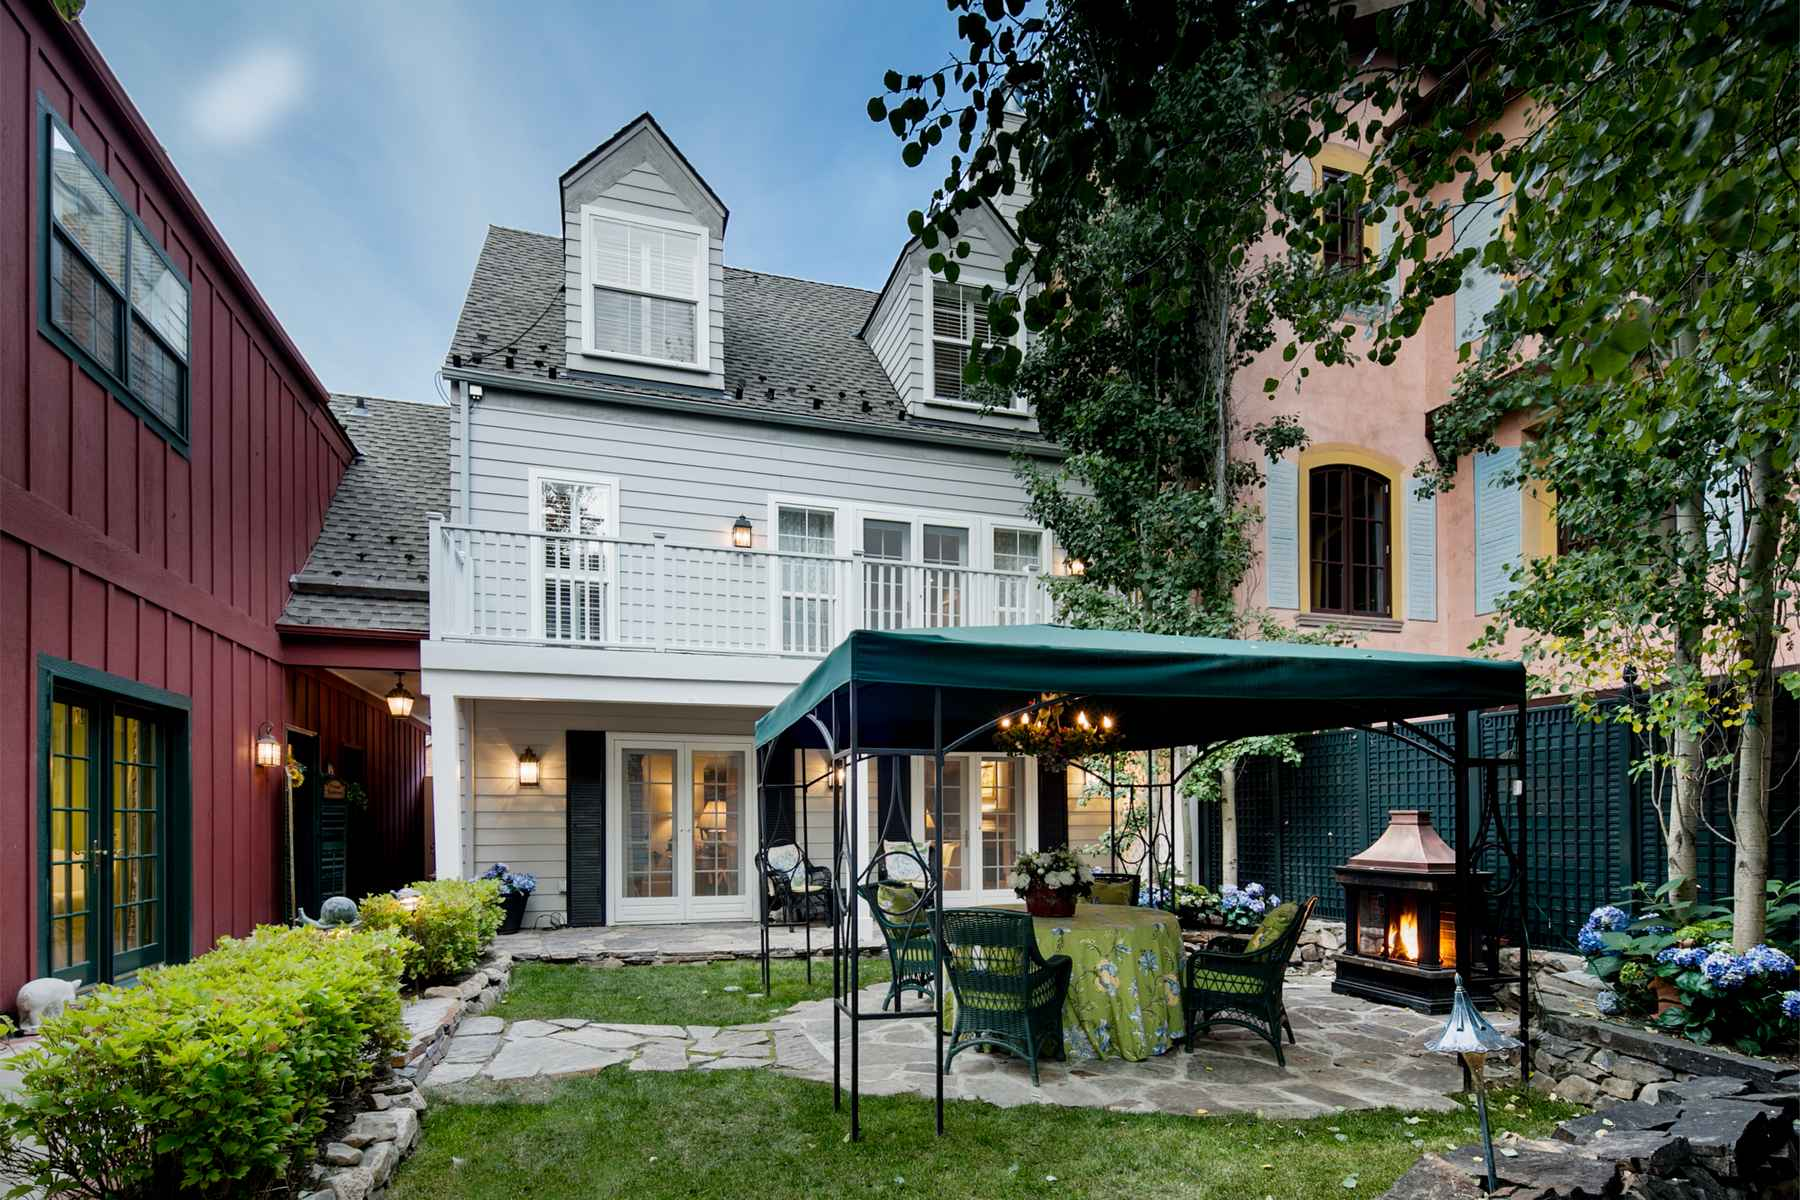 Condominium for Sale at Ketchum's Best Kept Secret 440 N. East Ave #2 Ketchum, Idaho, 83340 United States